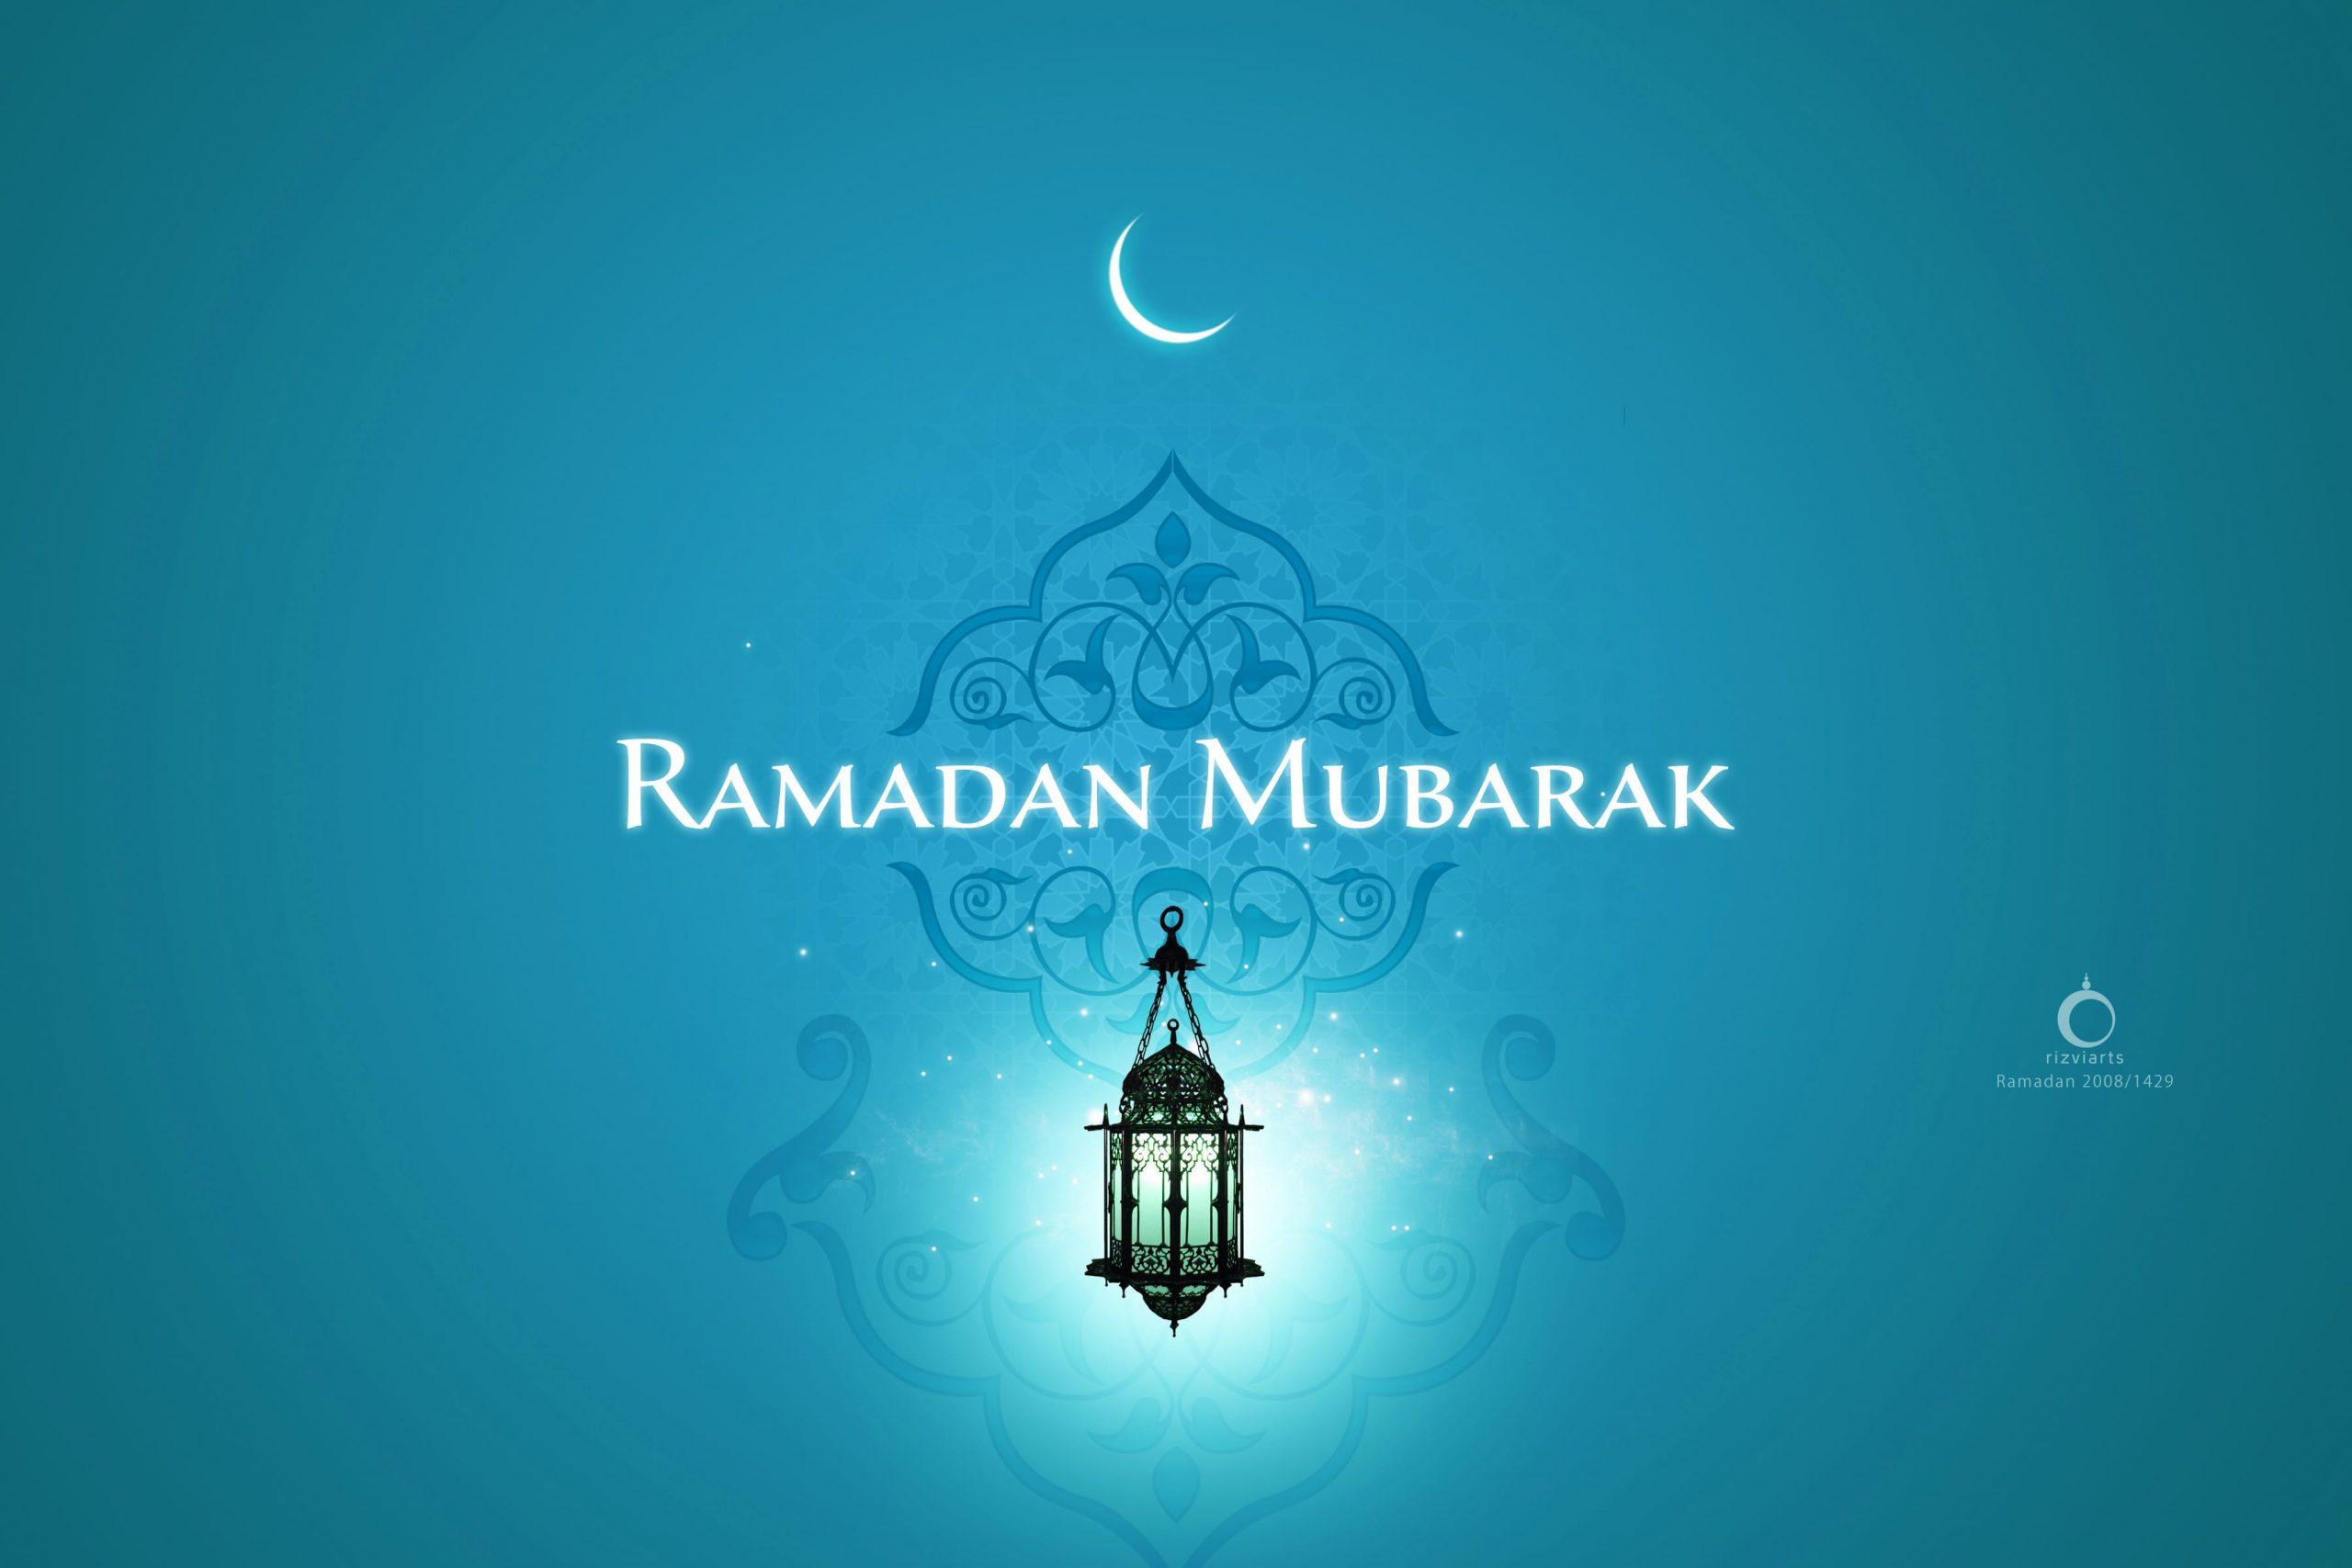 صور رمضان 2020 أجمل صور فوانيس رمضان 2021 بطاقات تهنئة لرمضان تهنئة رمضان بالأسماء 26